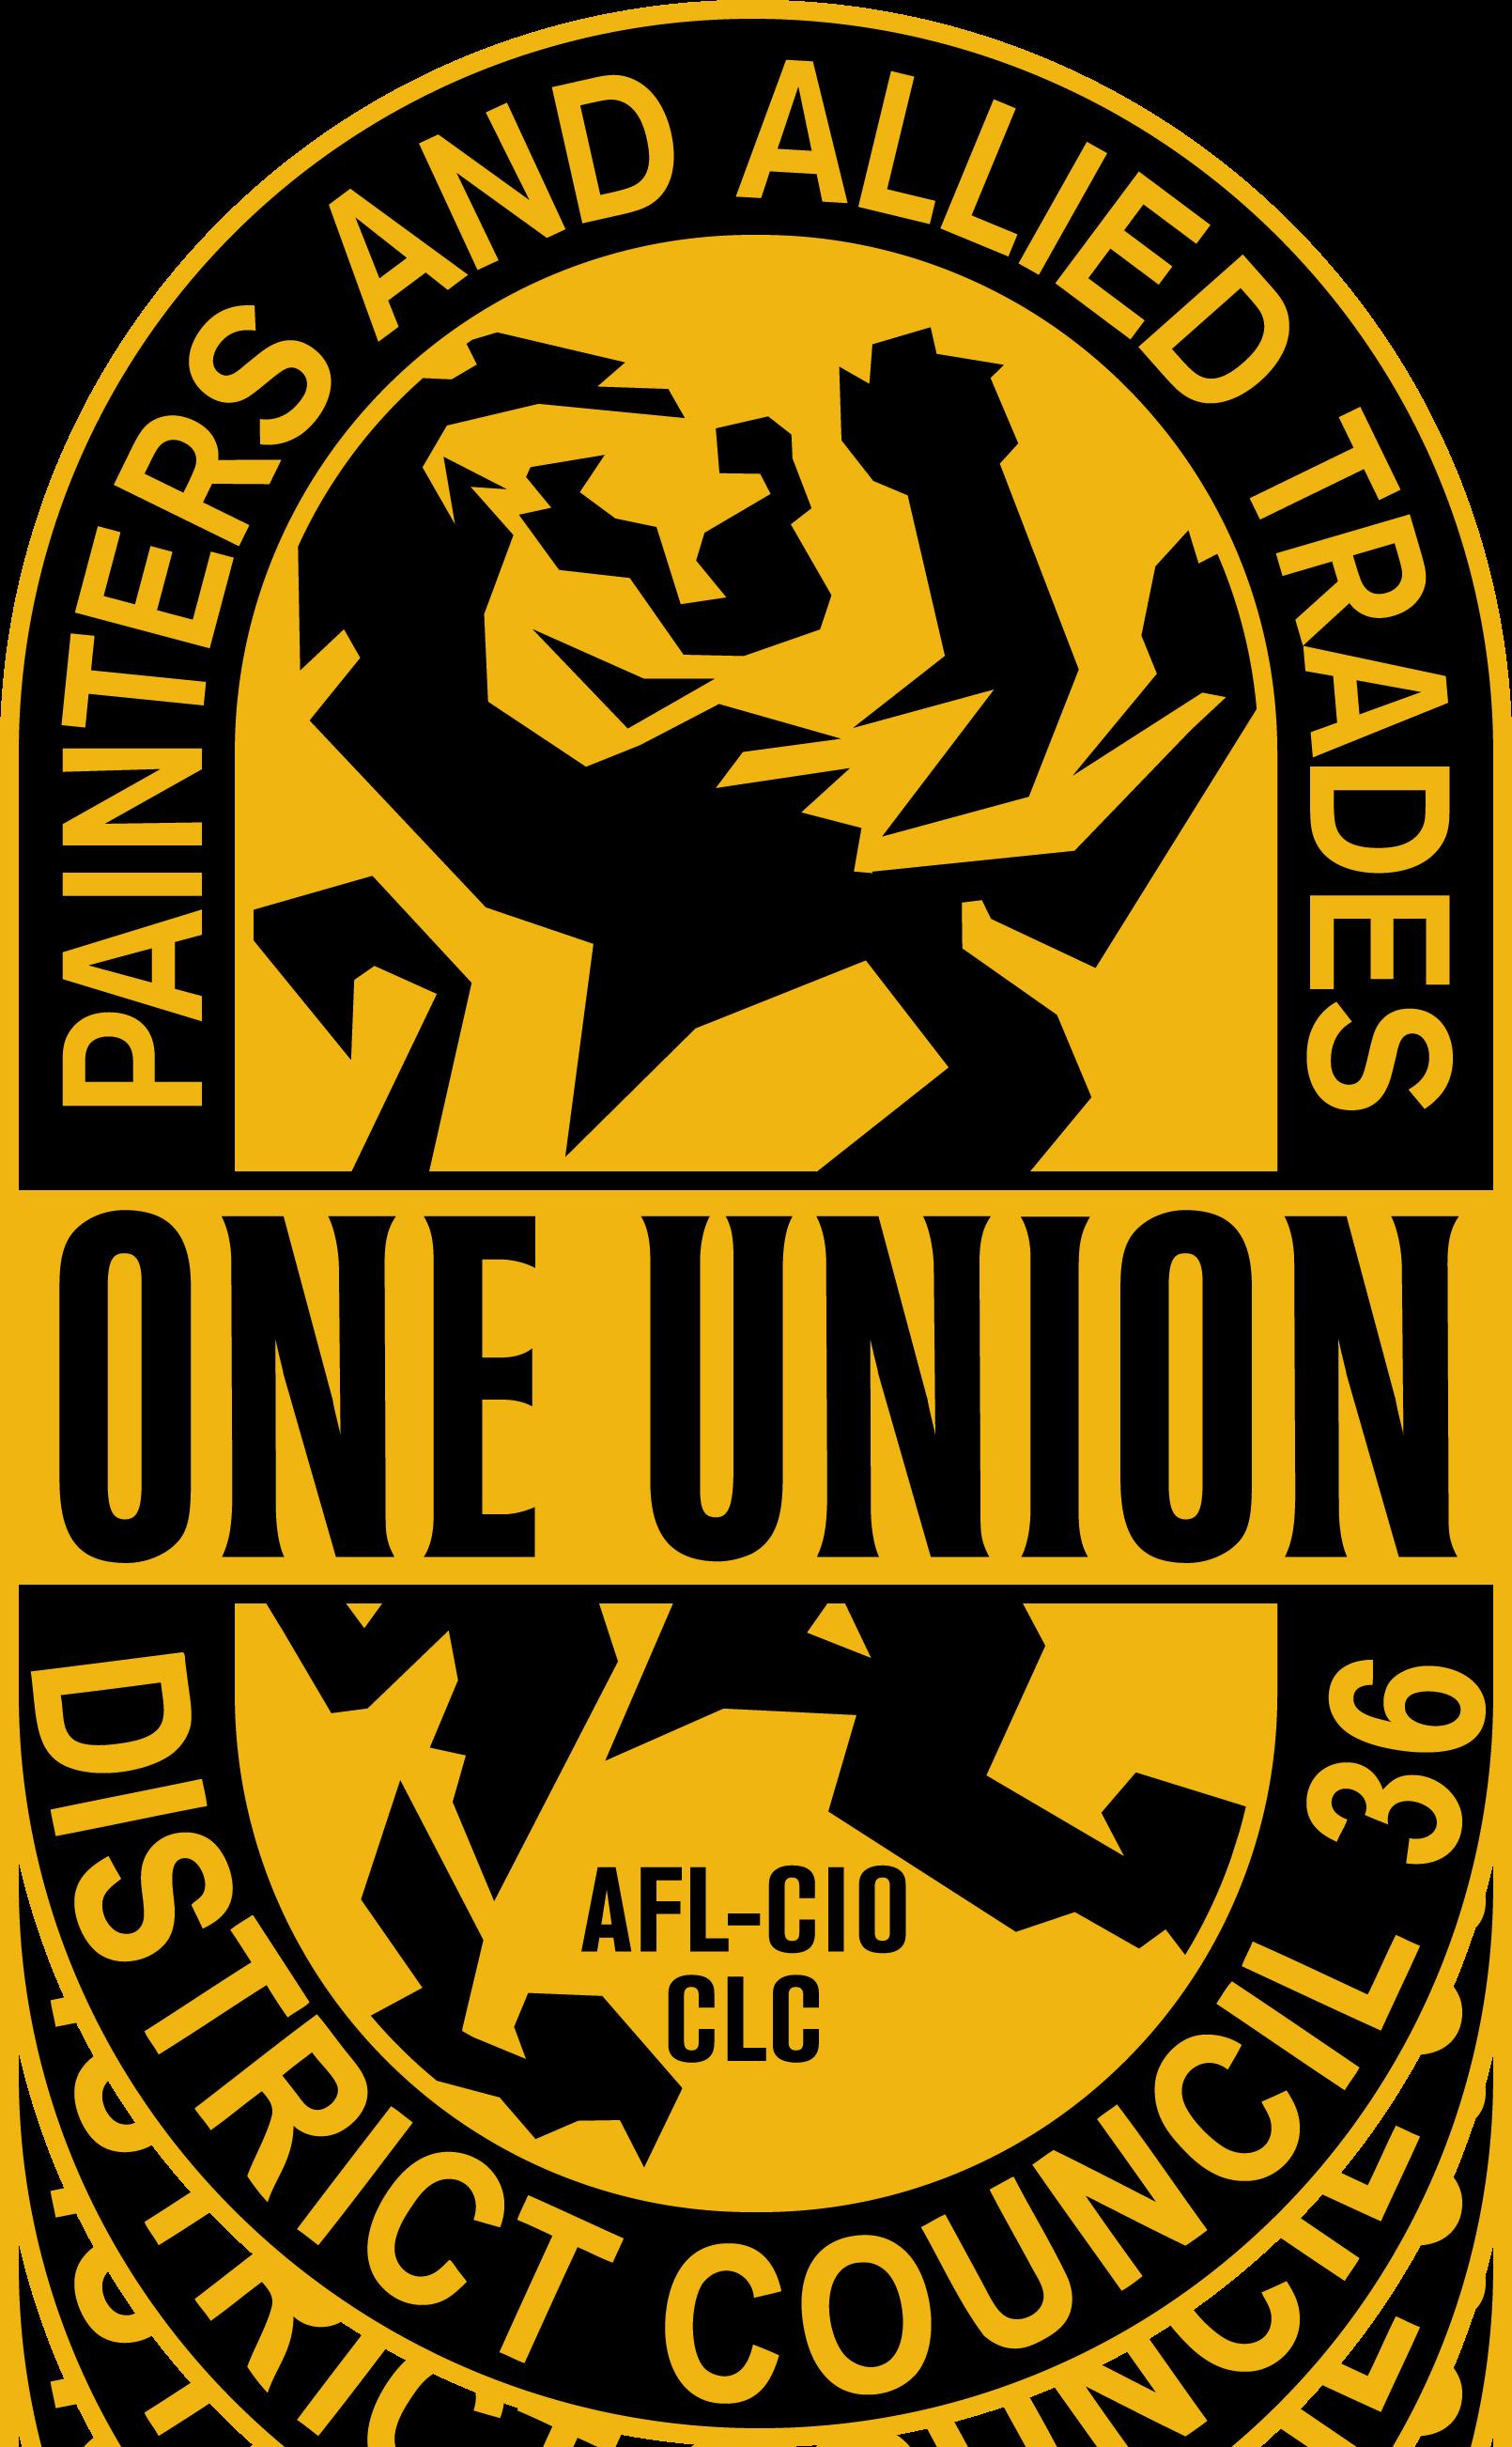 Logo_IUPAT_1_Union_2C_07_DC36.png